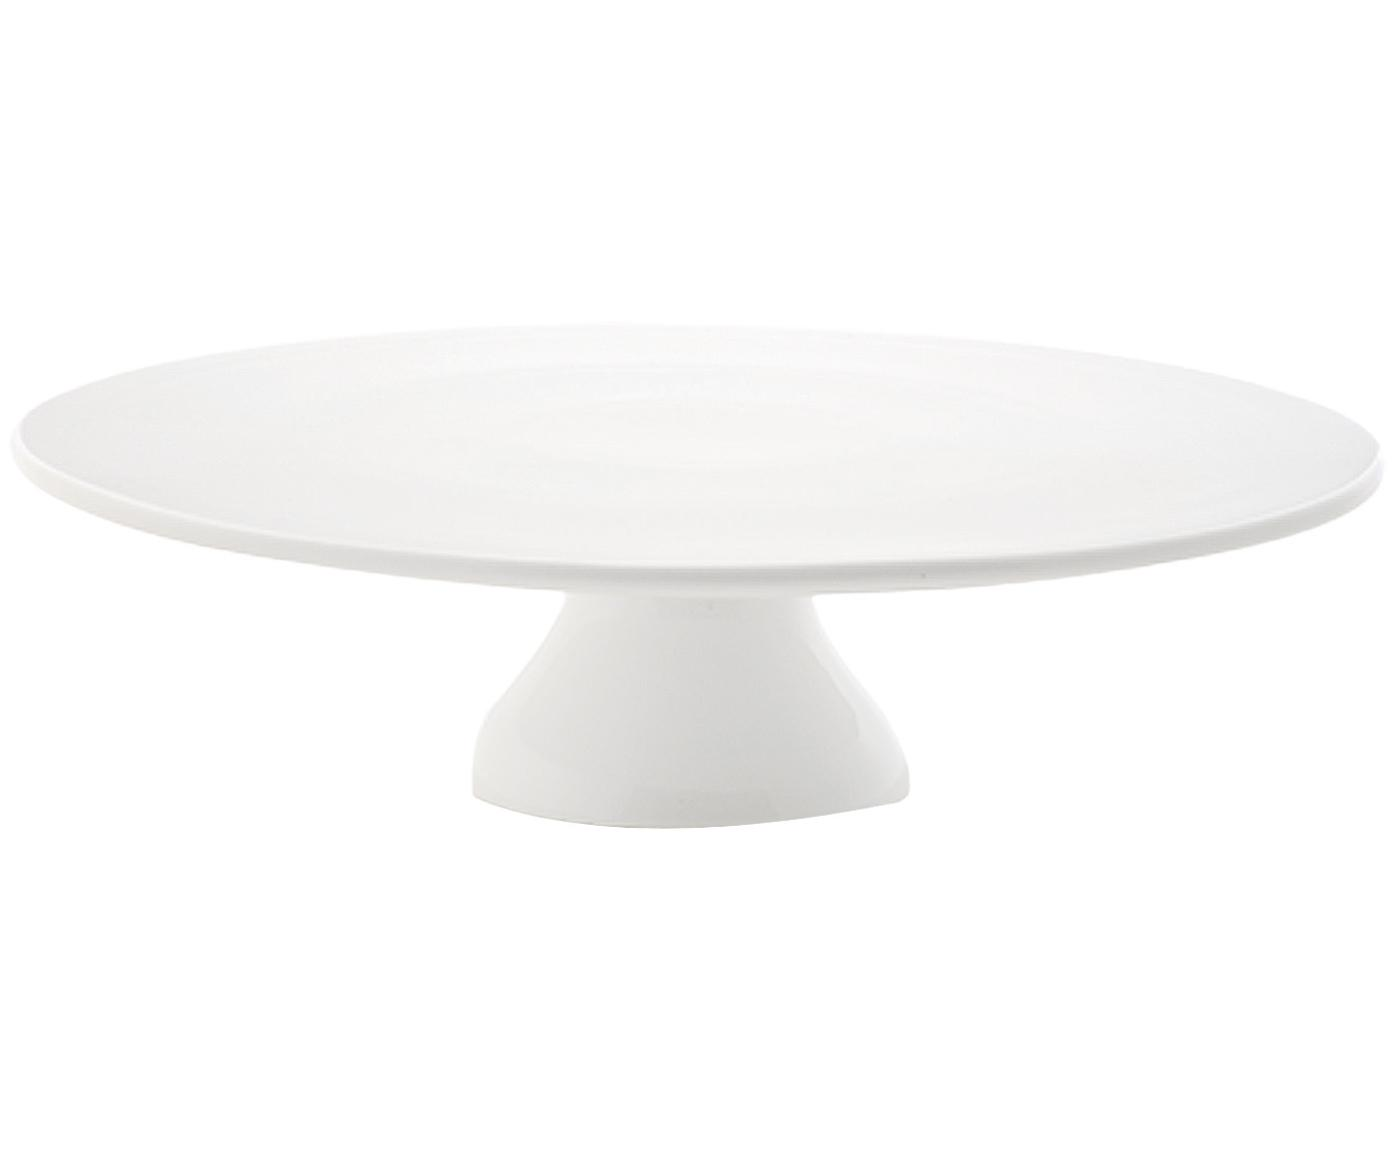 Fuente para postre Yanis, Porcelana, Blanco, Ø 33 cm